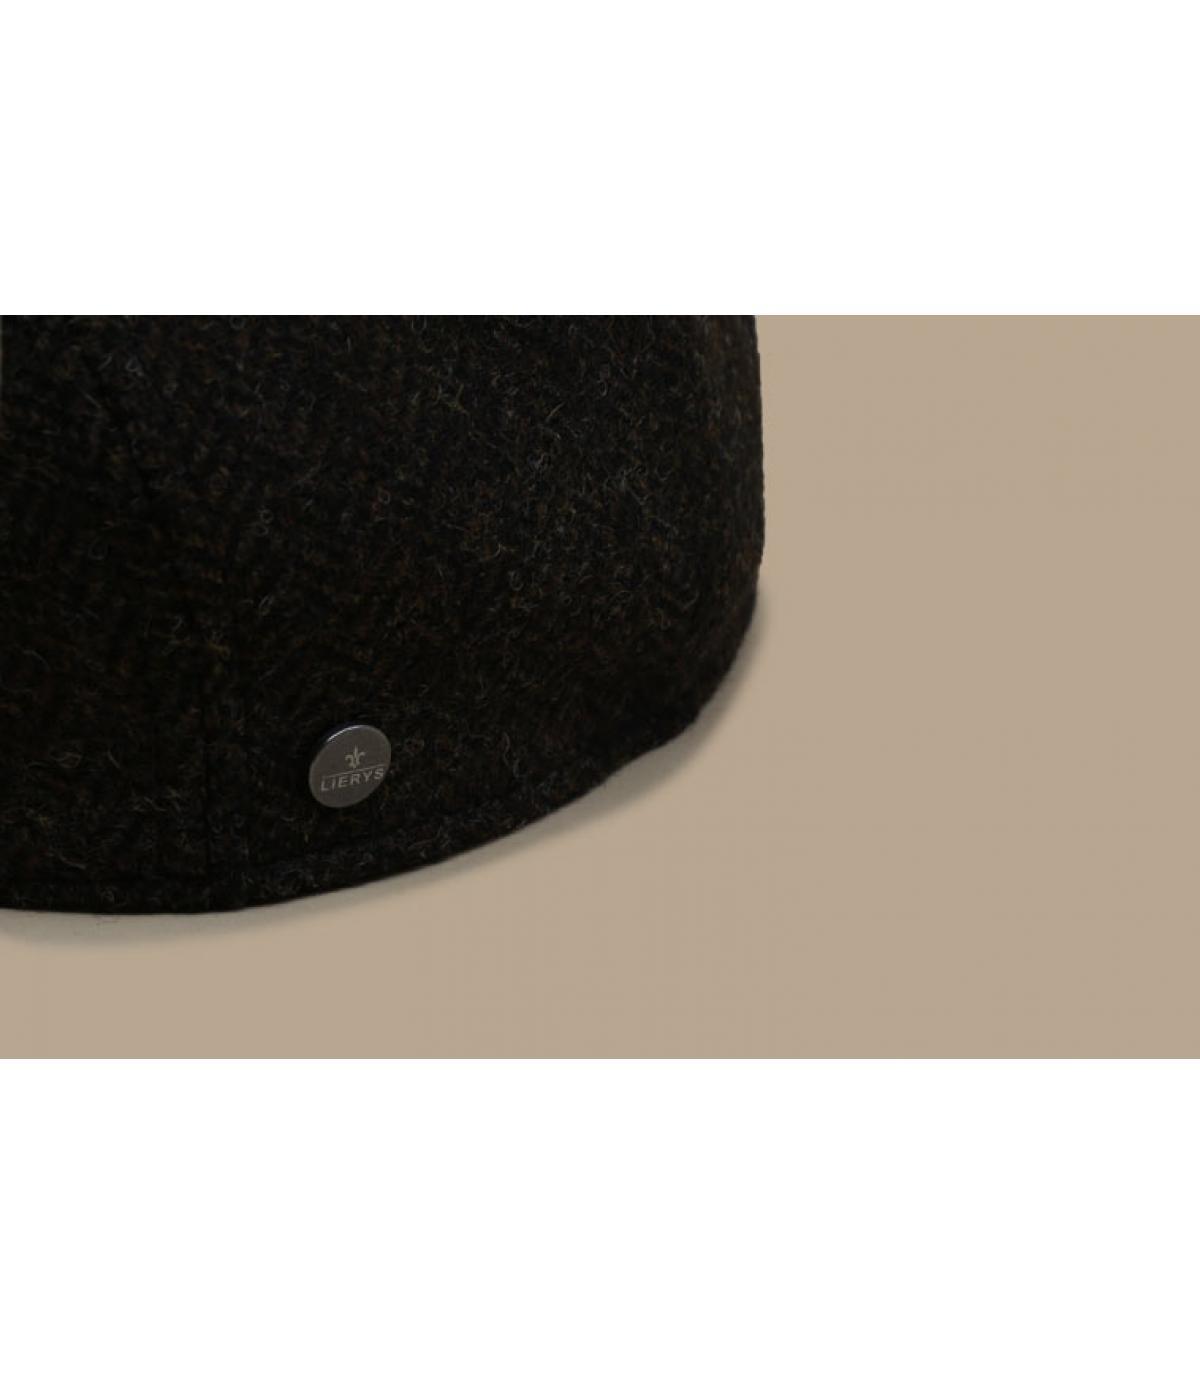 Details Britton Wool Herringbone brown - Abbildung 3